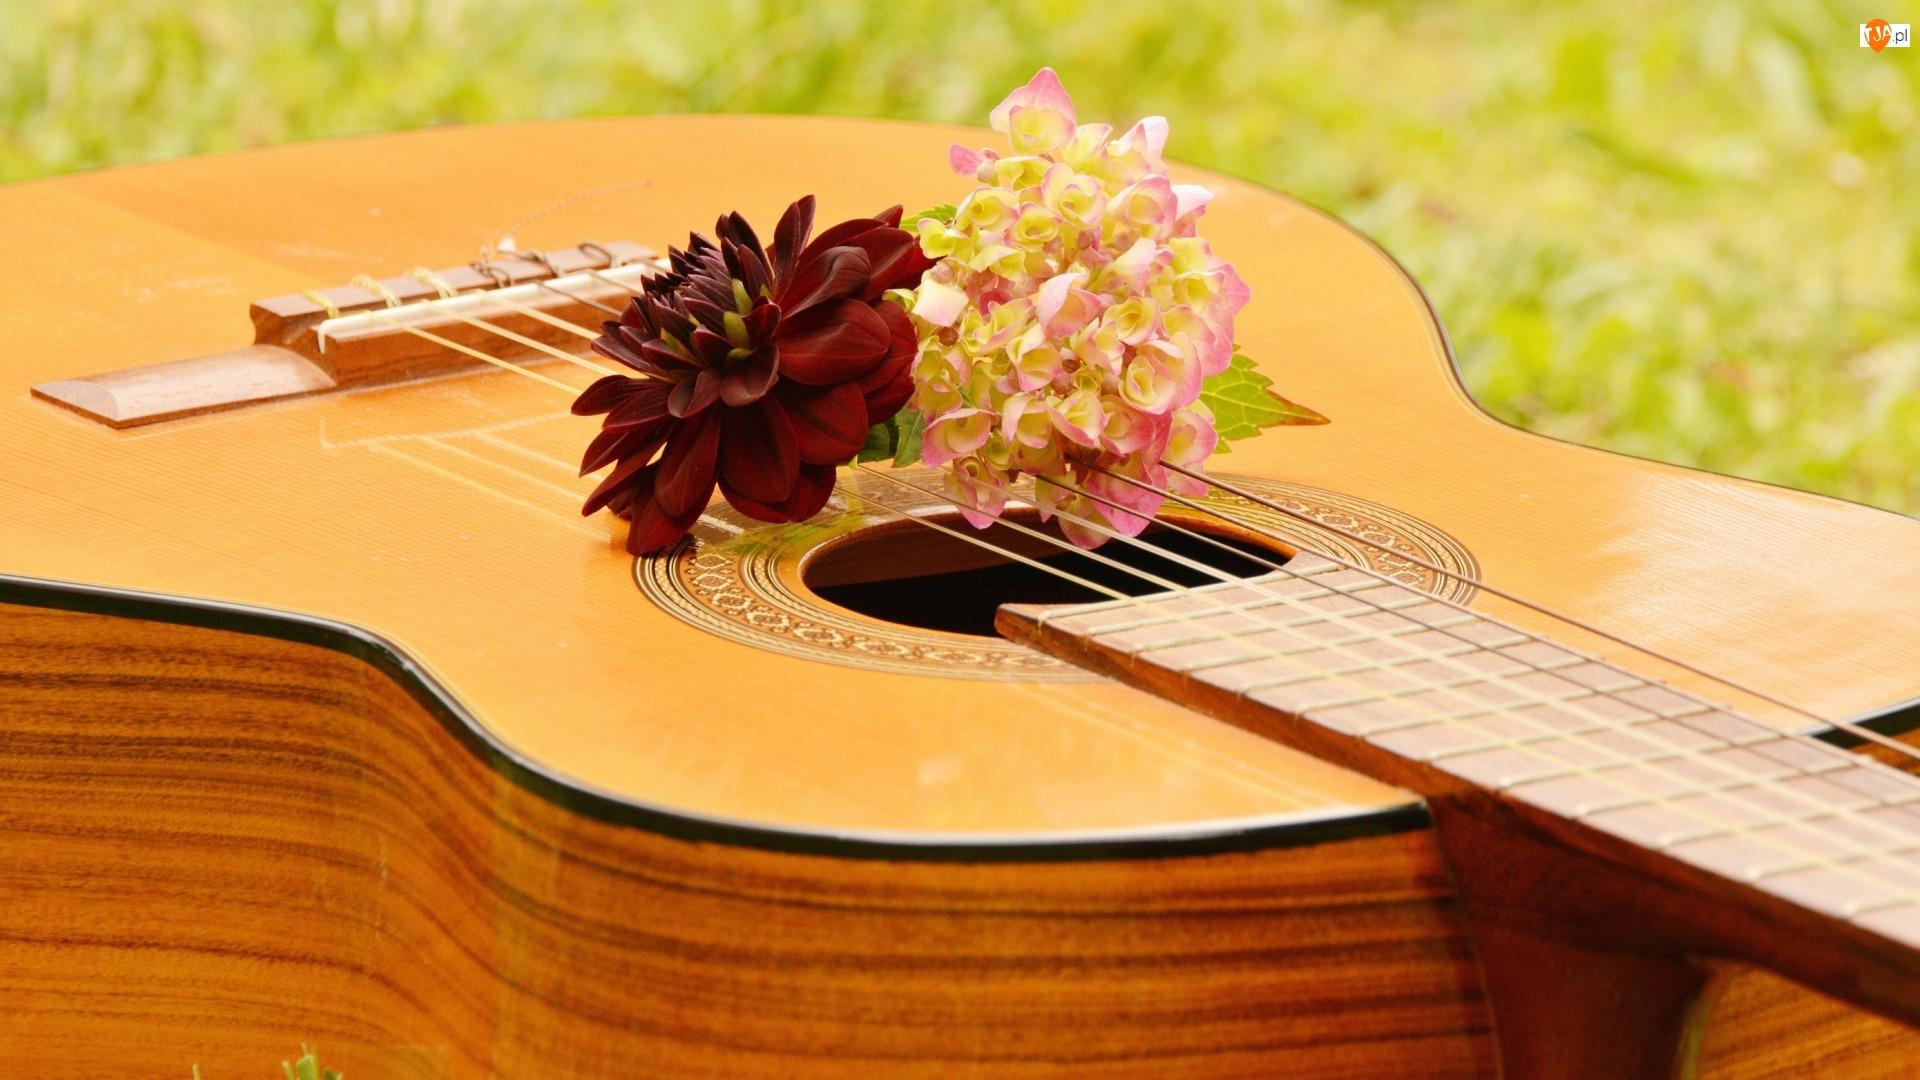 Dalia, Gitara, Kwiaty, Hortensja